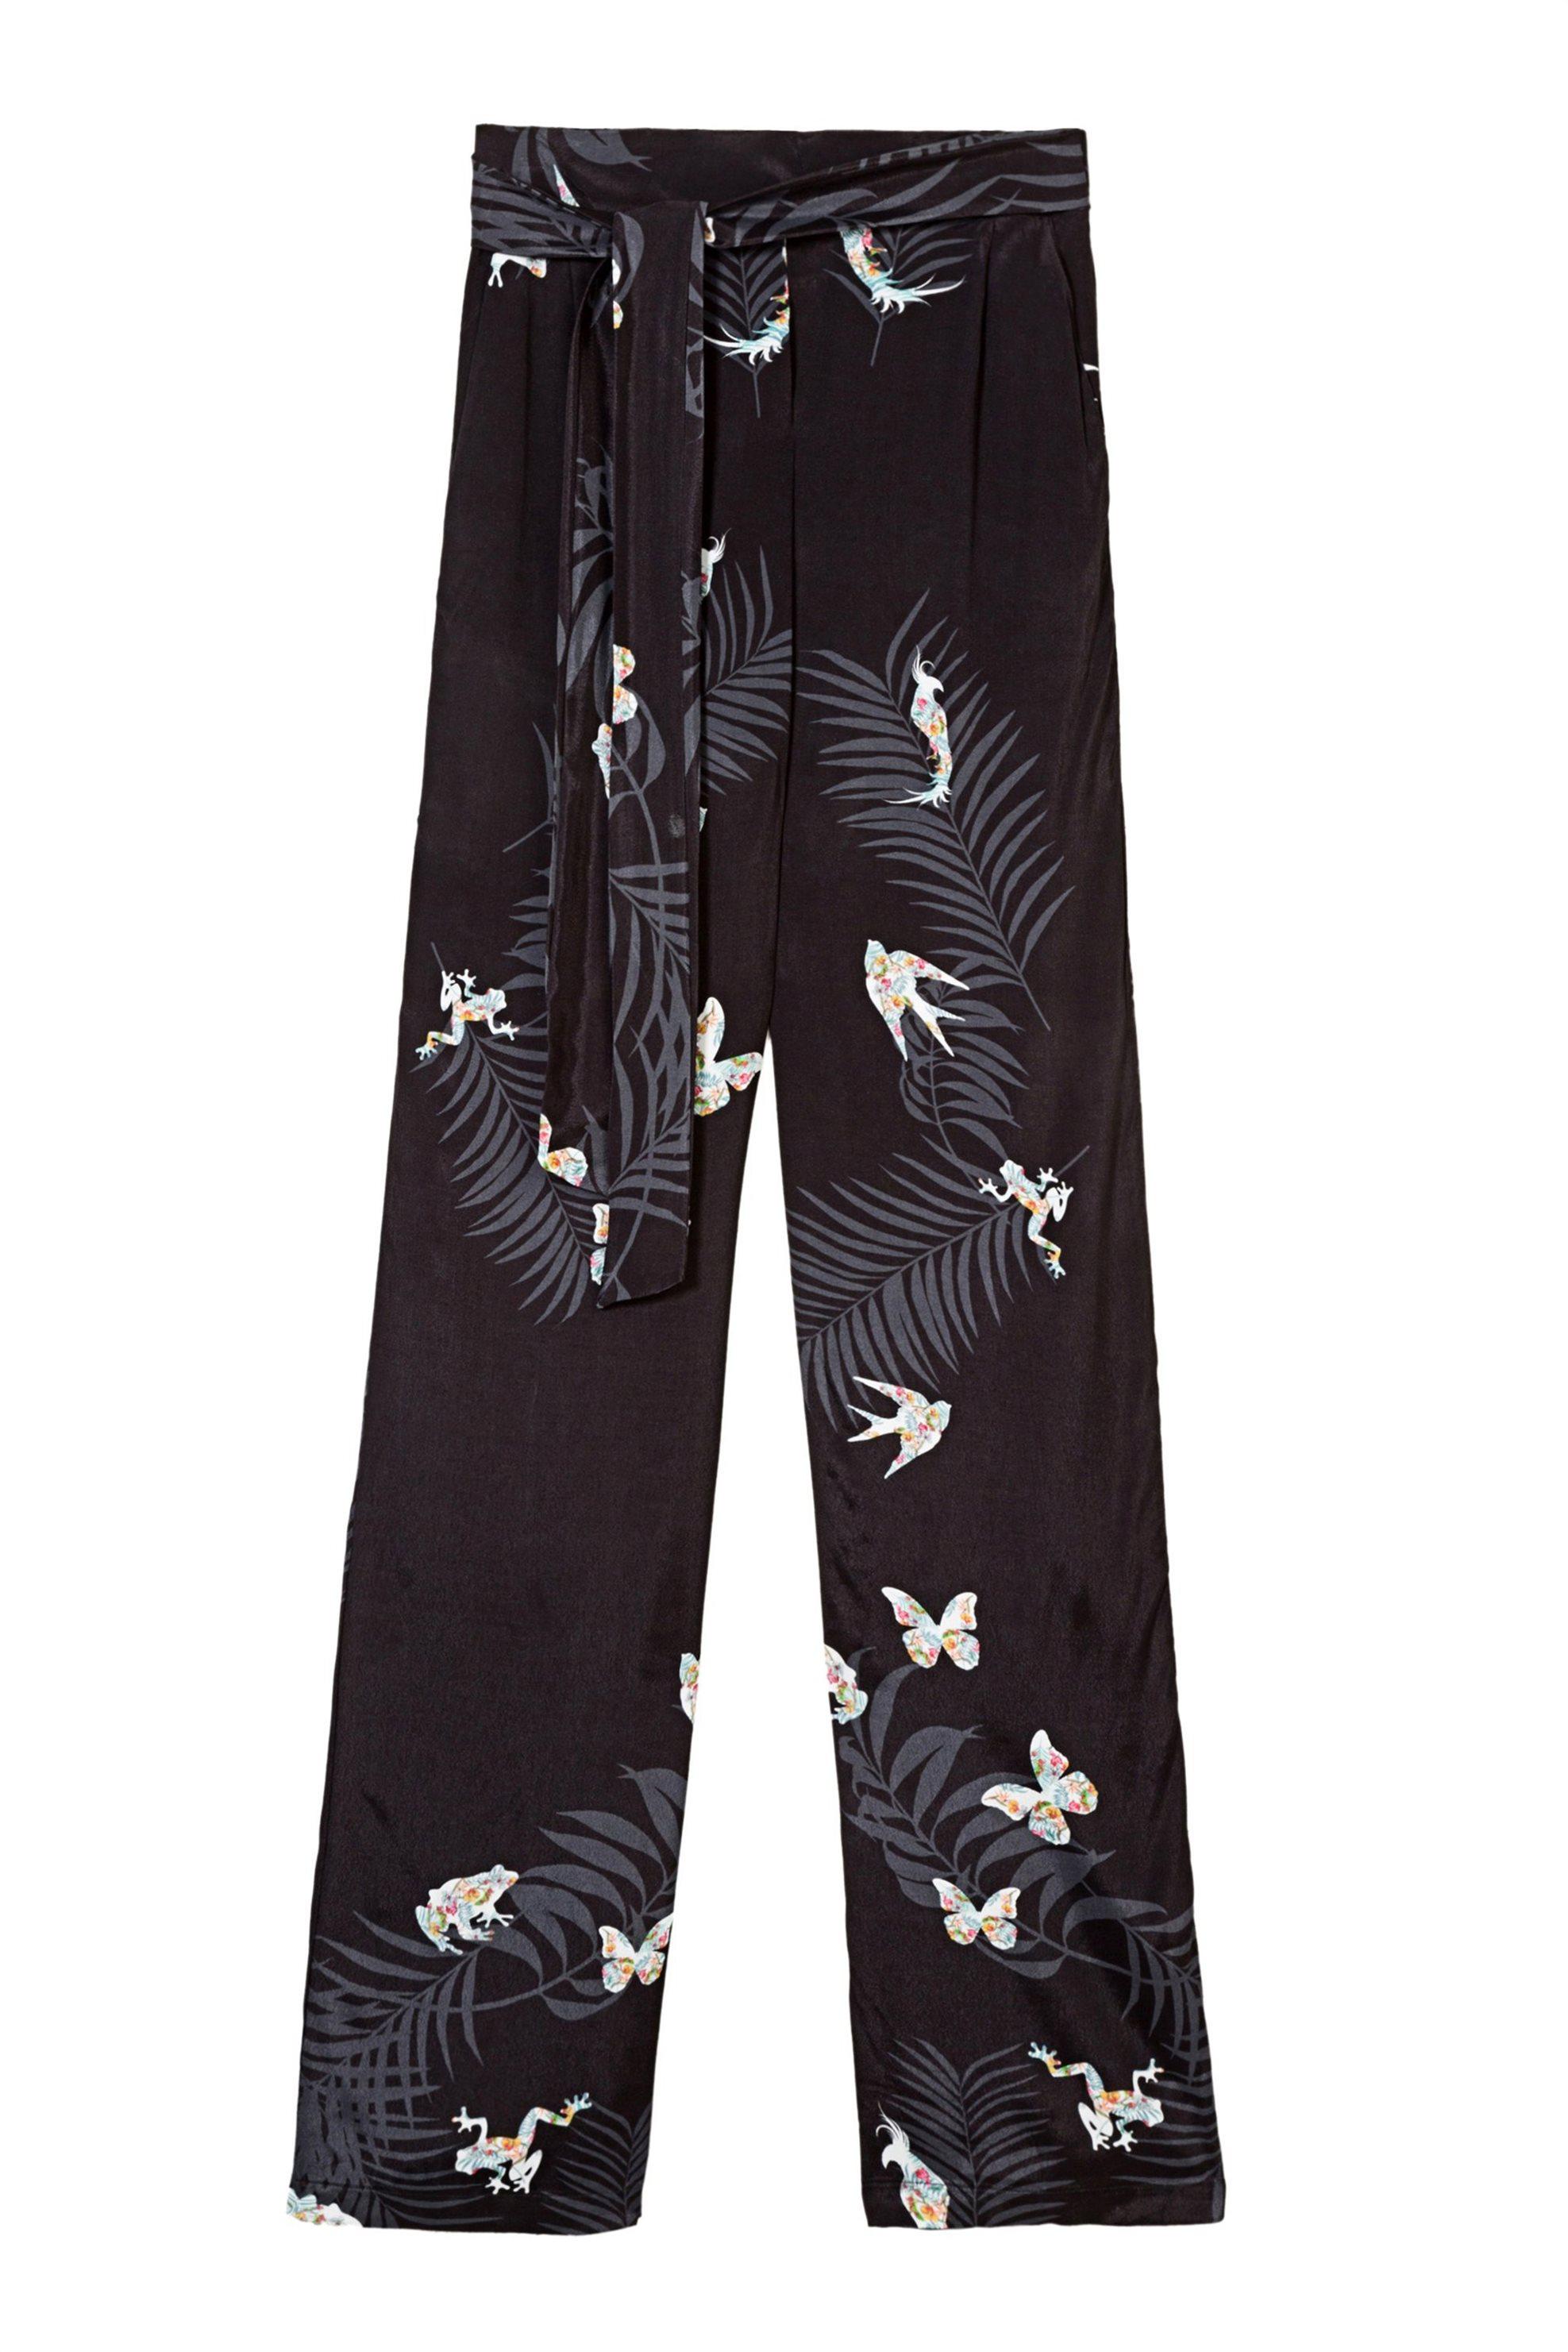 25c333616e8d Γυναικεία   Ρούχα   Παντελόνια   Casual   Παντελόνες   Floral ...